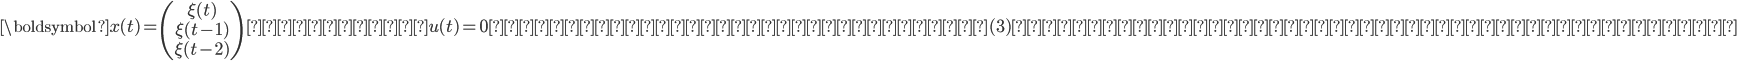 \displaystyle{ \boldsymbol{x}(t) = \begin{pmatrix}\xi(t)\\\xi(t-1)\\\xi(t-2)\end{pmatrix} \ とおき、u(t) = 0とすれば、以下の様に式(3)を行列で表現することができます。\\ }